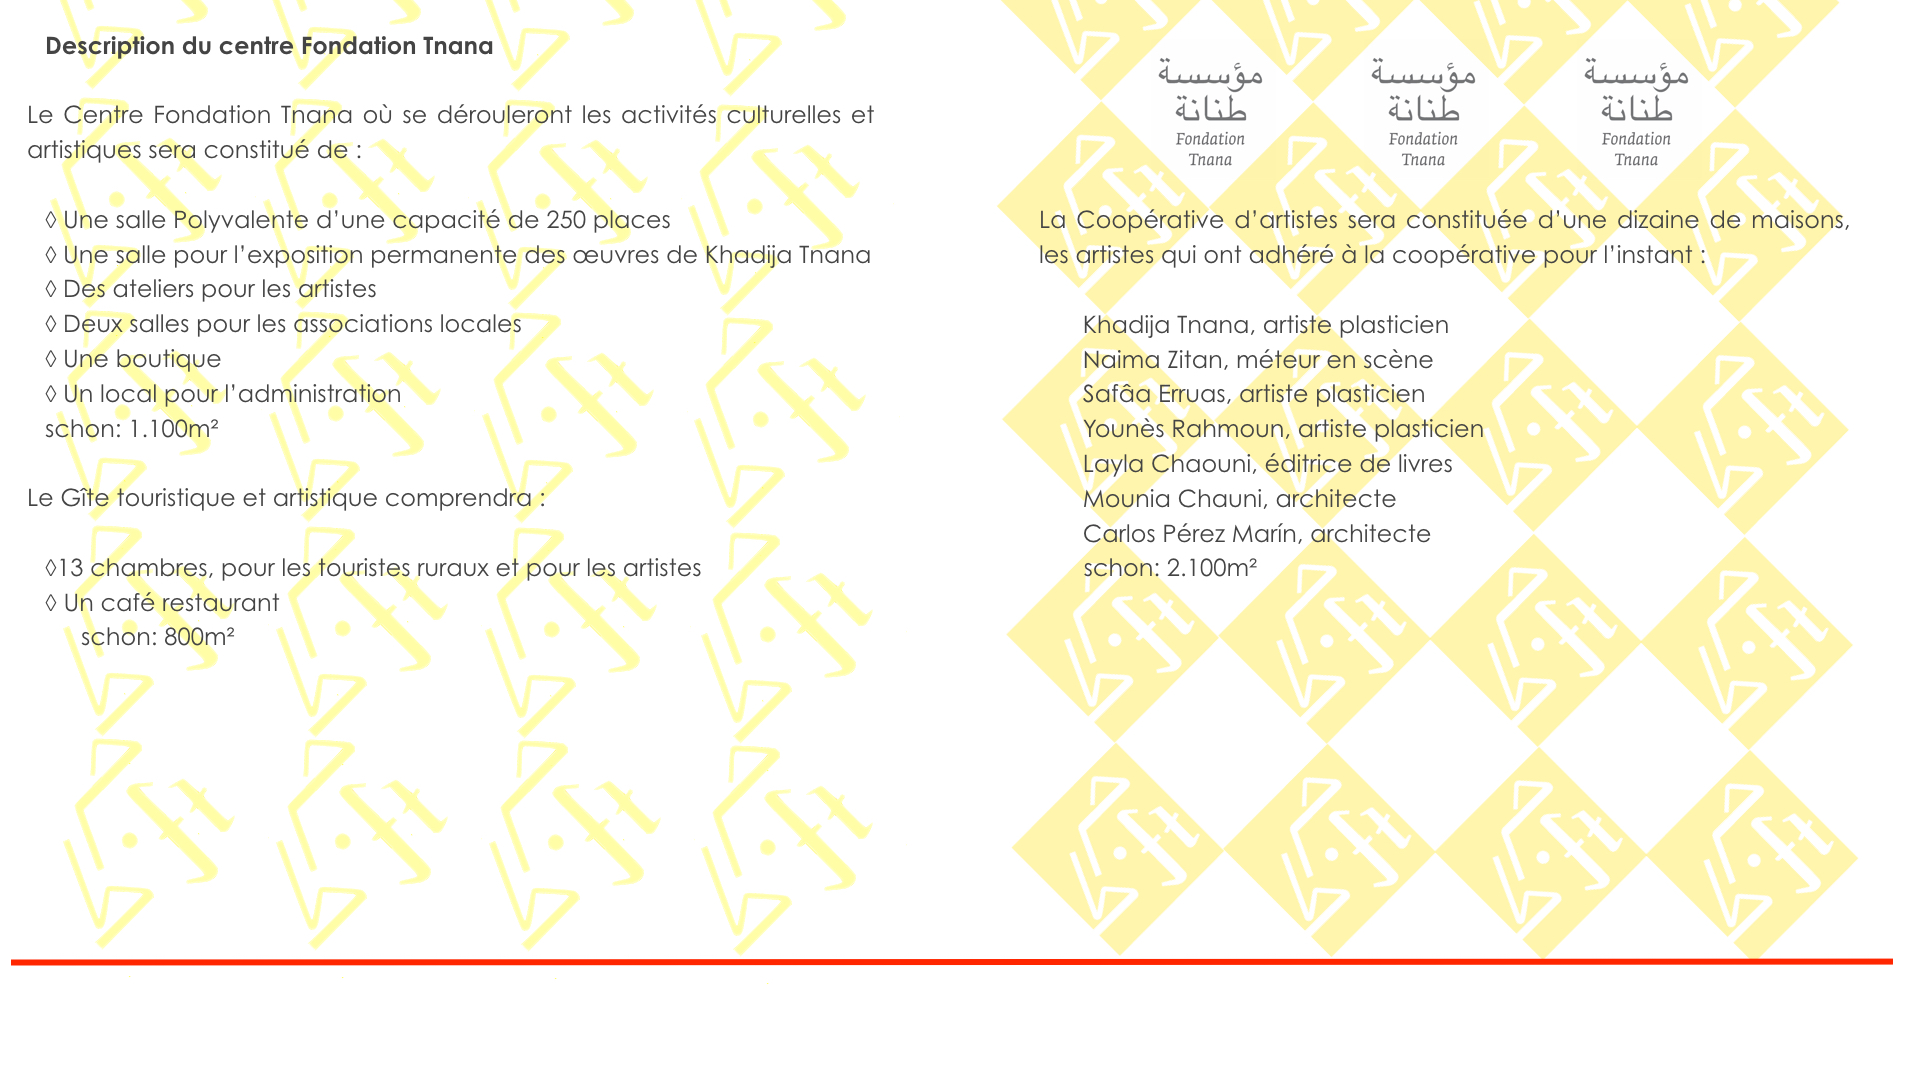 FONDATION TNANA DOSSIER PDF 10.08.17.005.jpeg